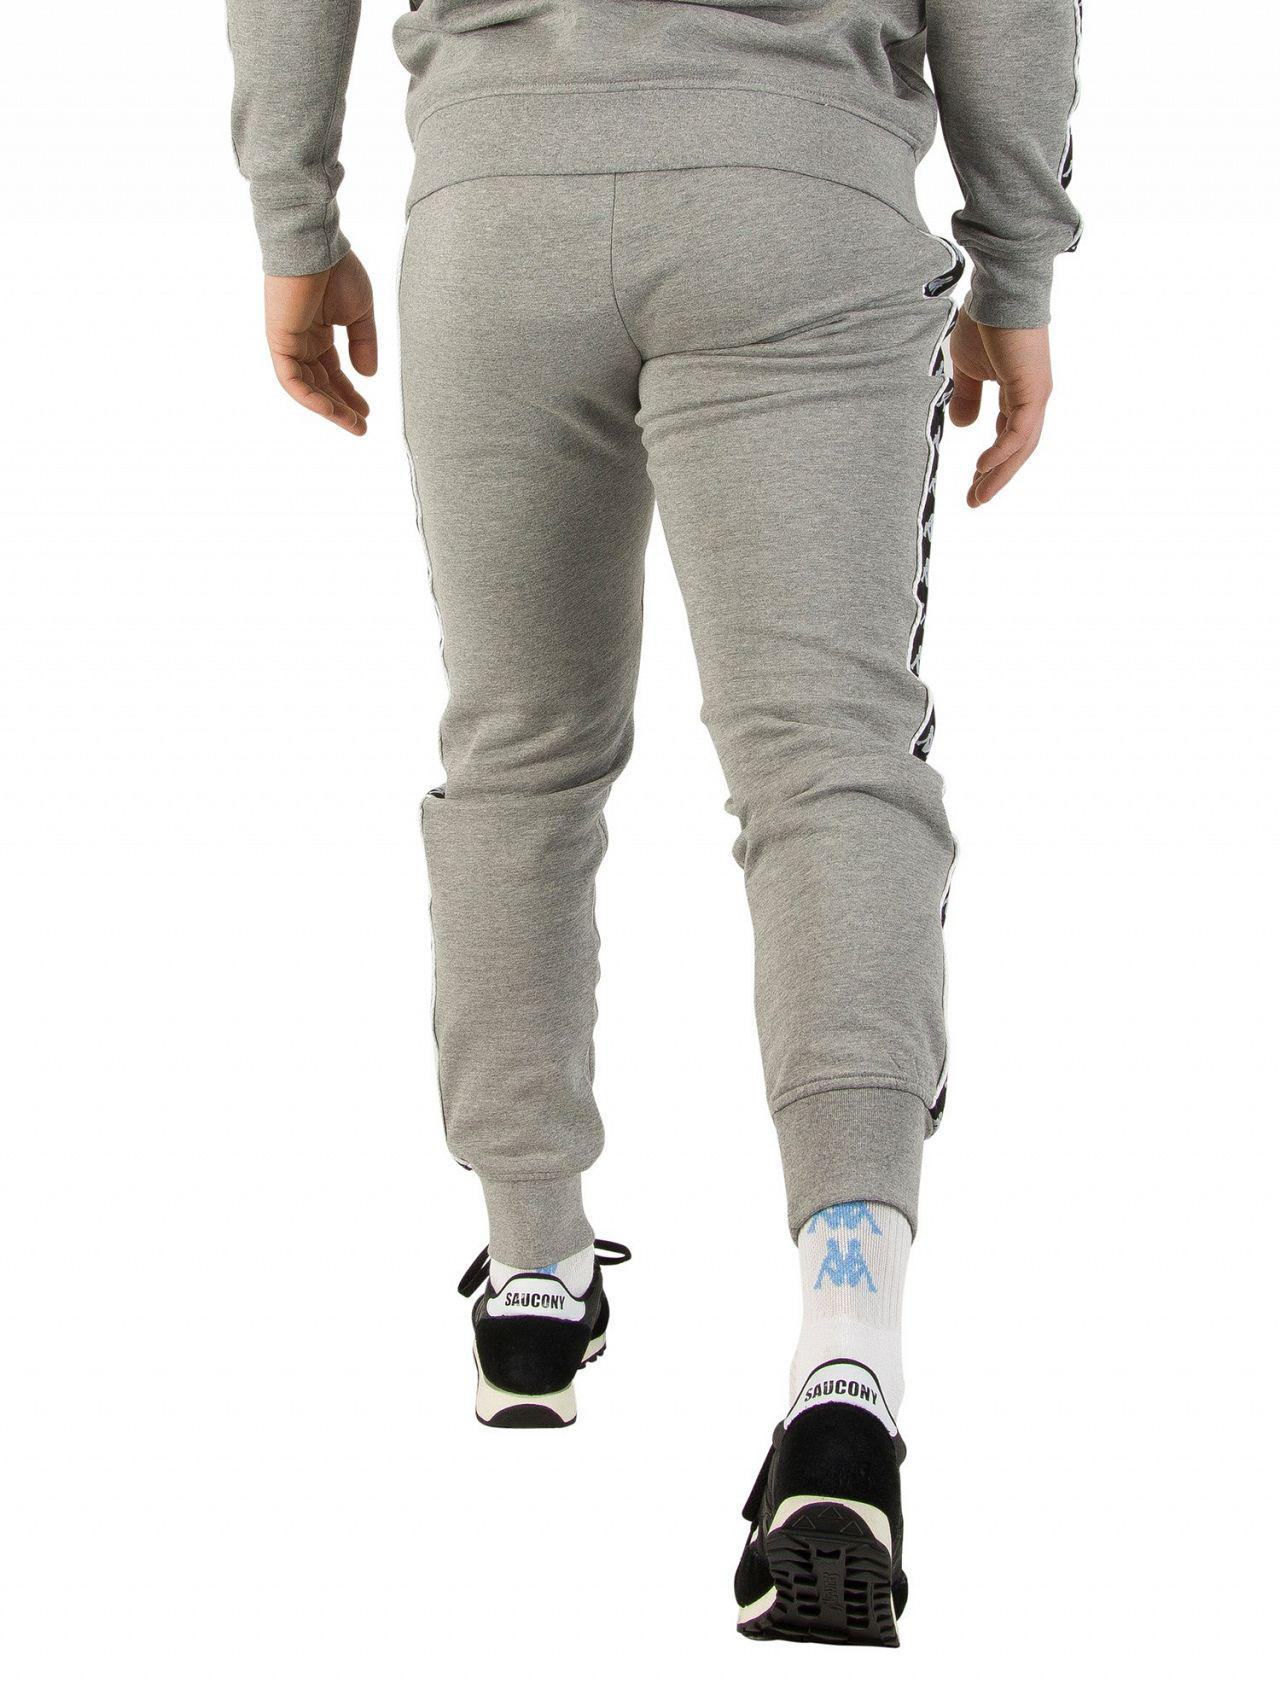 9acdbb17 Kappa Gray Grey Melange/black Authentic Lucio Slim Joggers for men